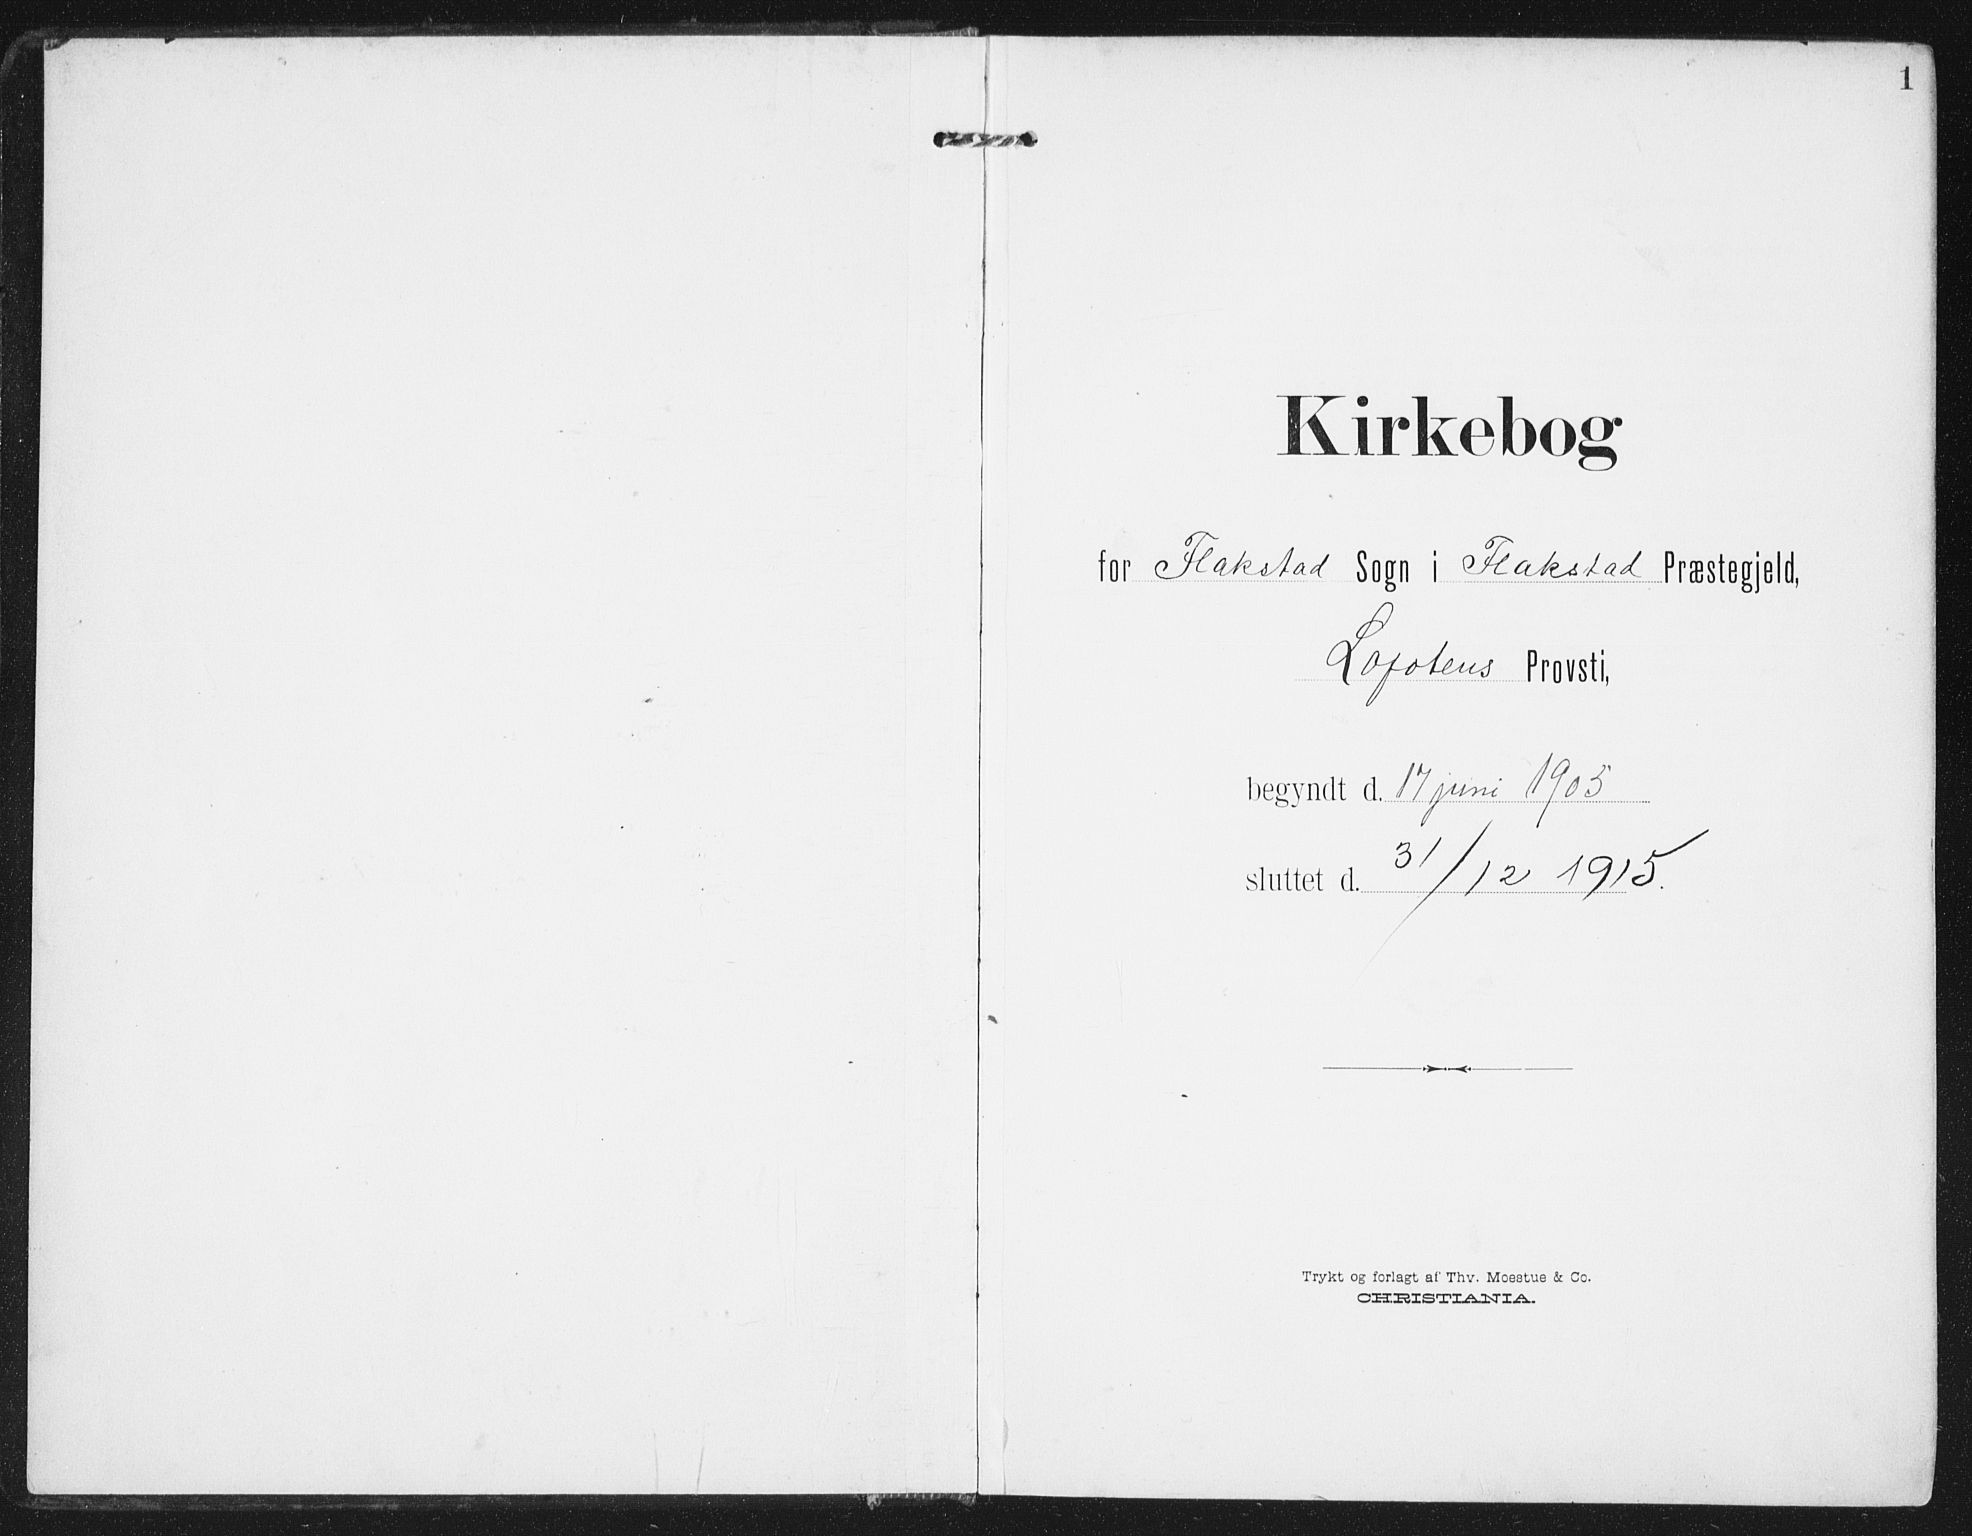 SAT, Ministerialprotokoller, klokkerbøker og fødselsregistre - Nordland, 885/L1206: Ministerialbok nr. 885A07, 1905-1915, s. 1